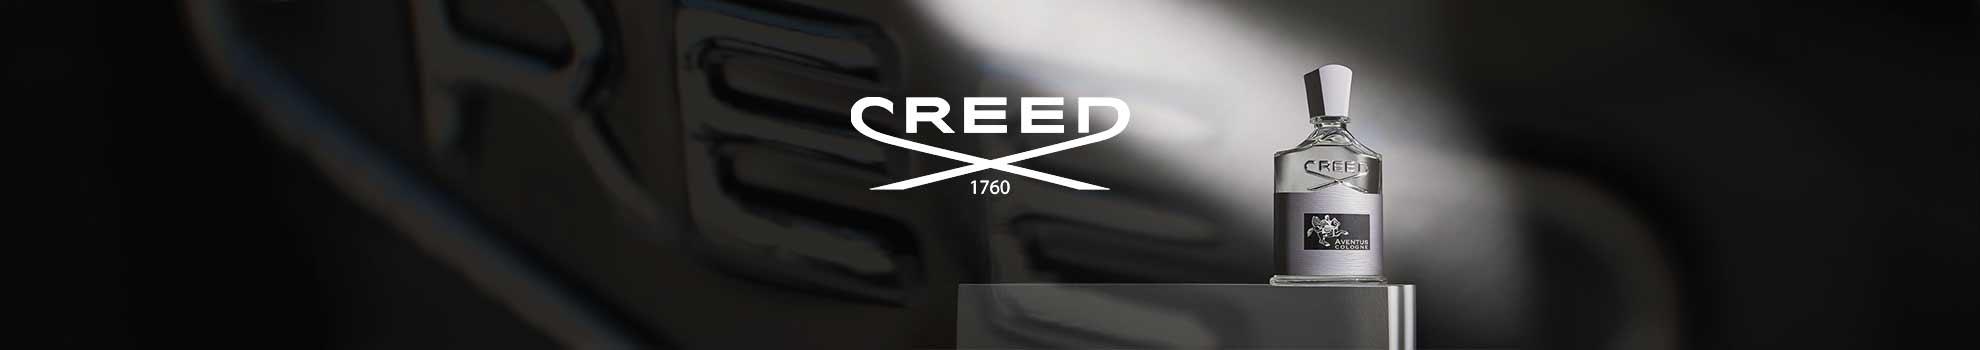 1510971-1579199563